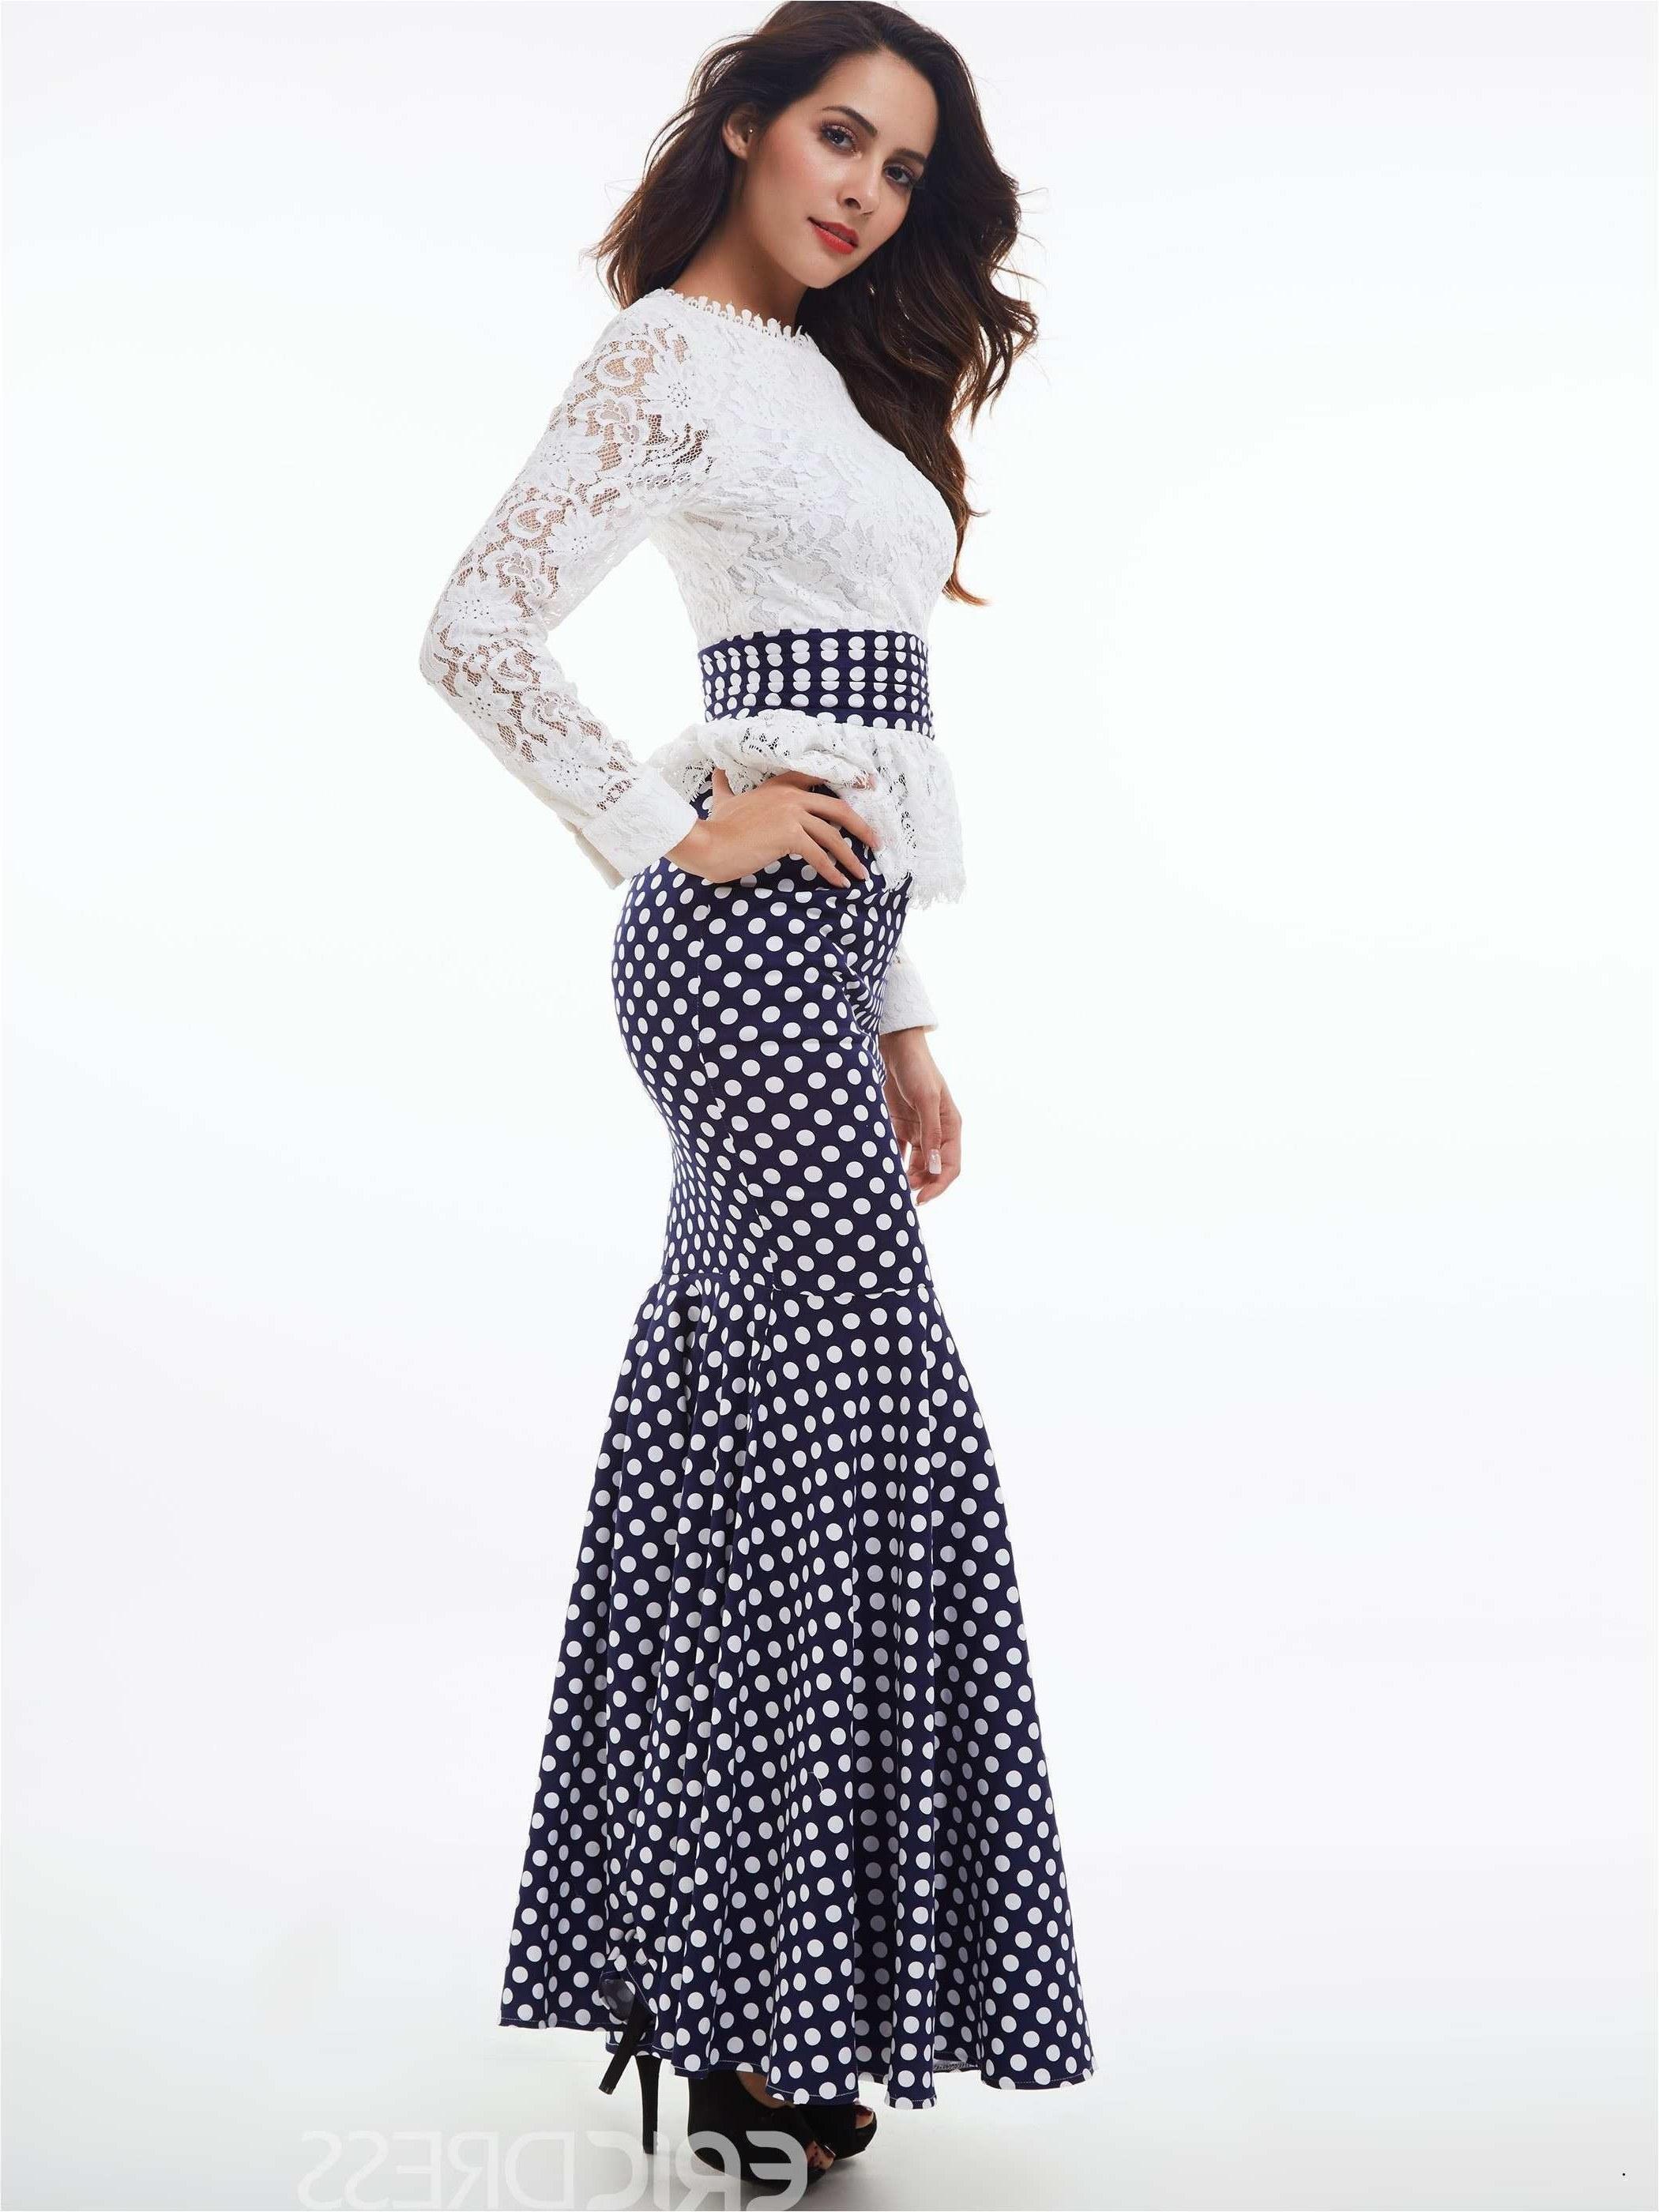 Model Baju Pengantin Muslim Qwdq Ecehispanic